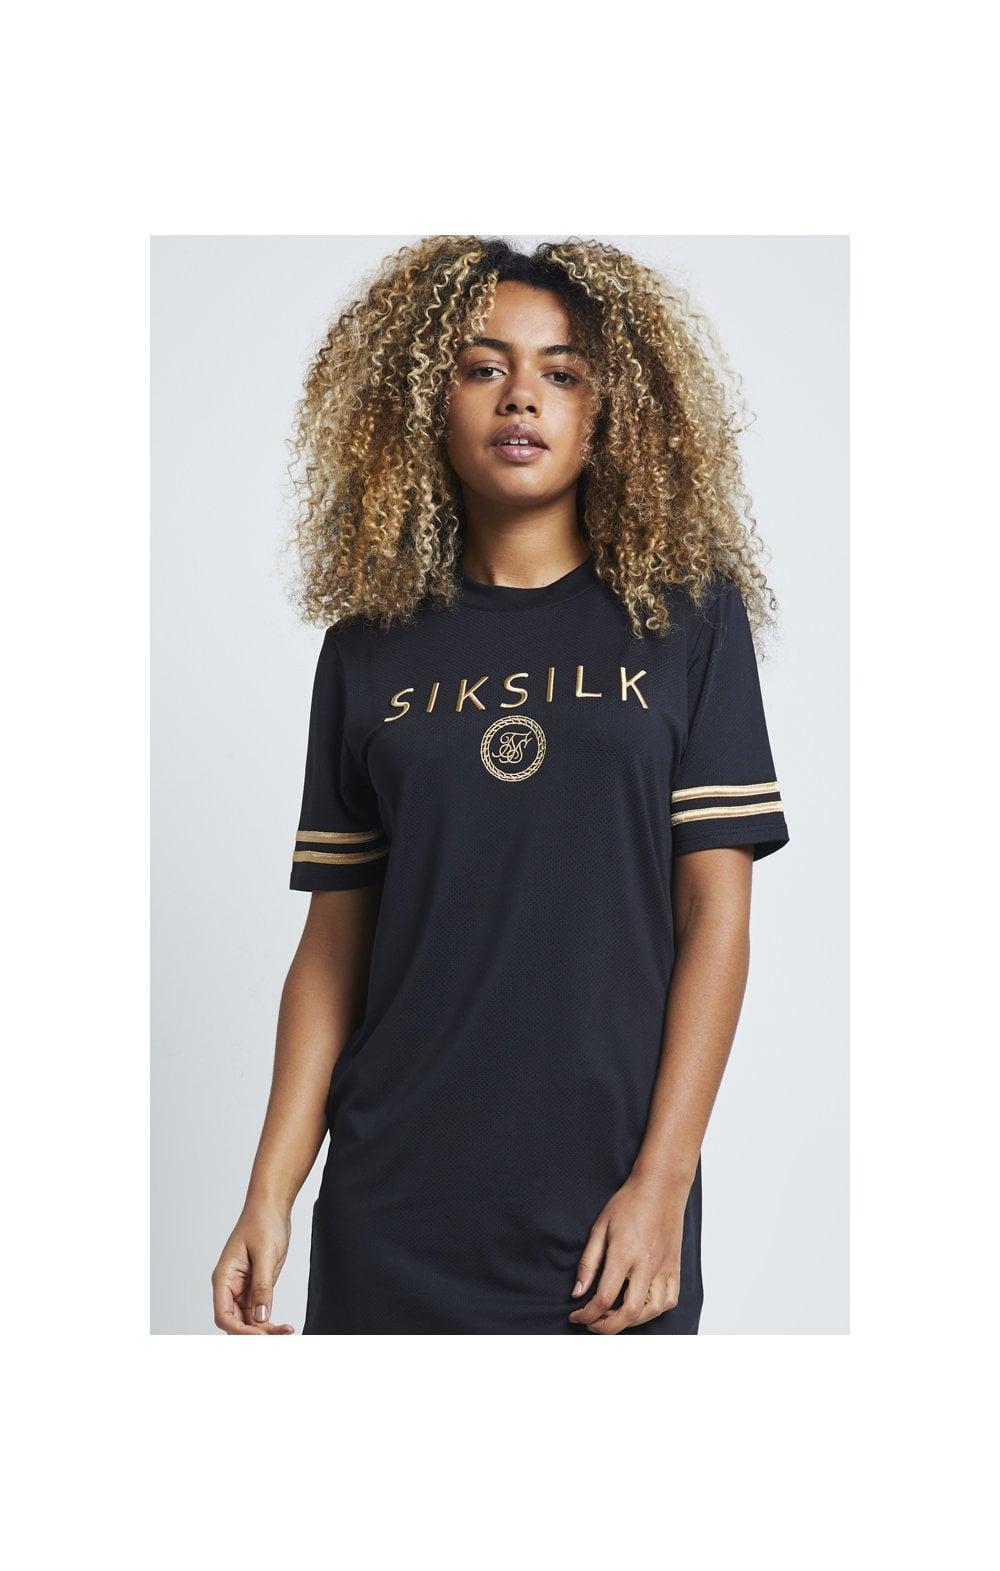 SikSilk Mesh T-Shirt Dress - Black  WOMEN SIZES: 8-XS